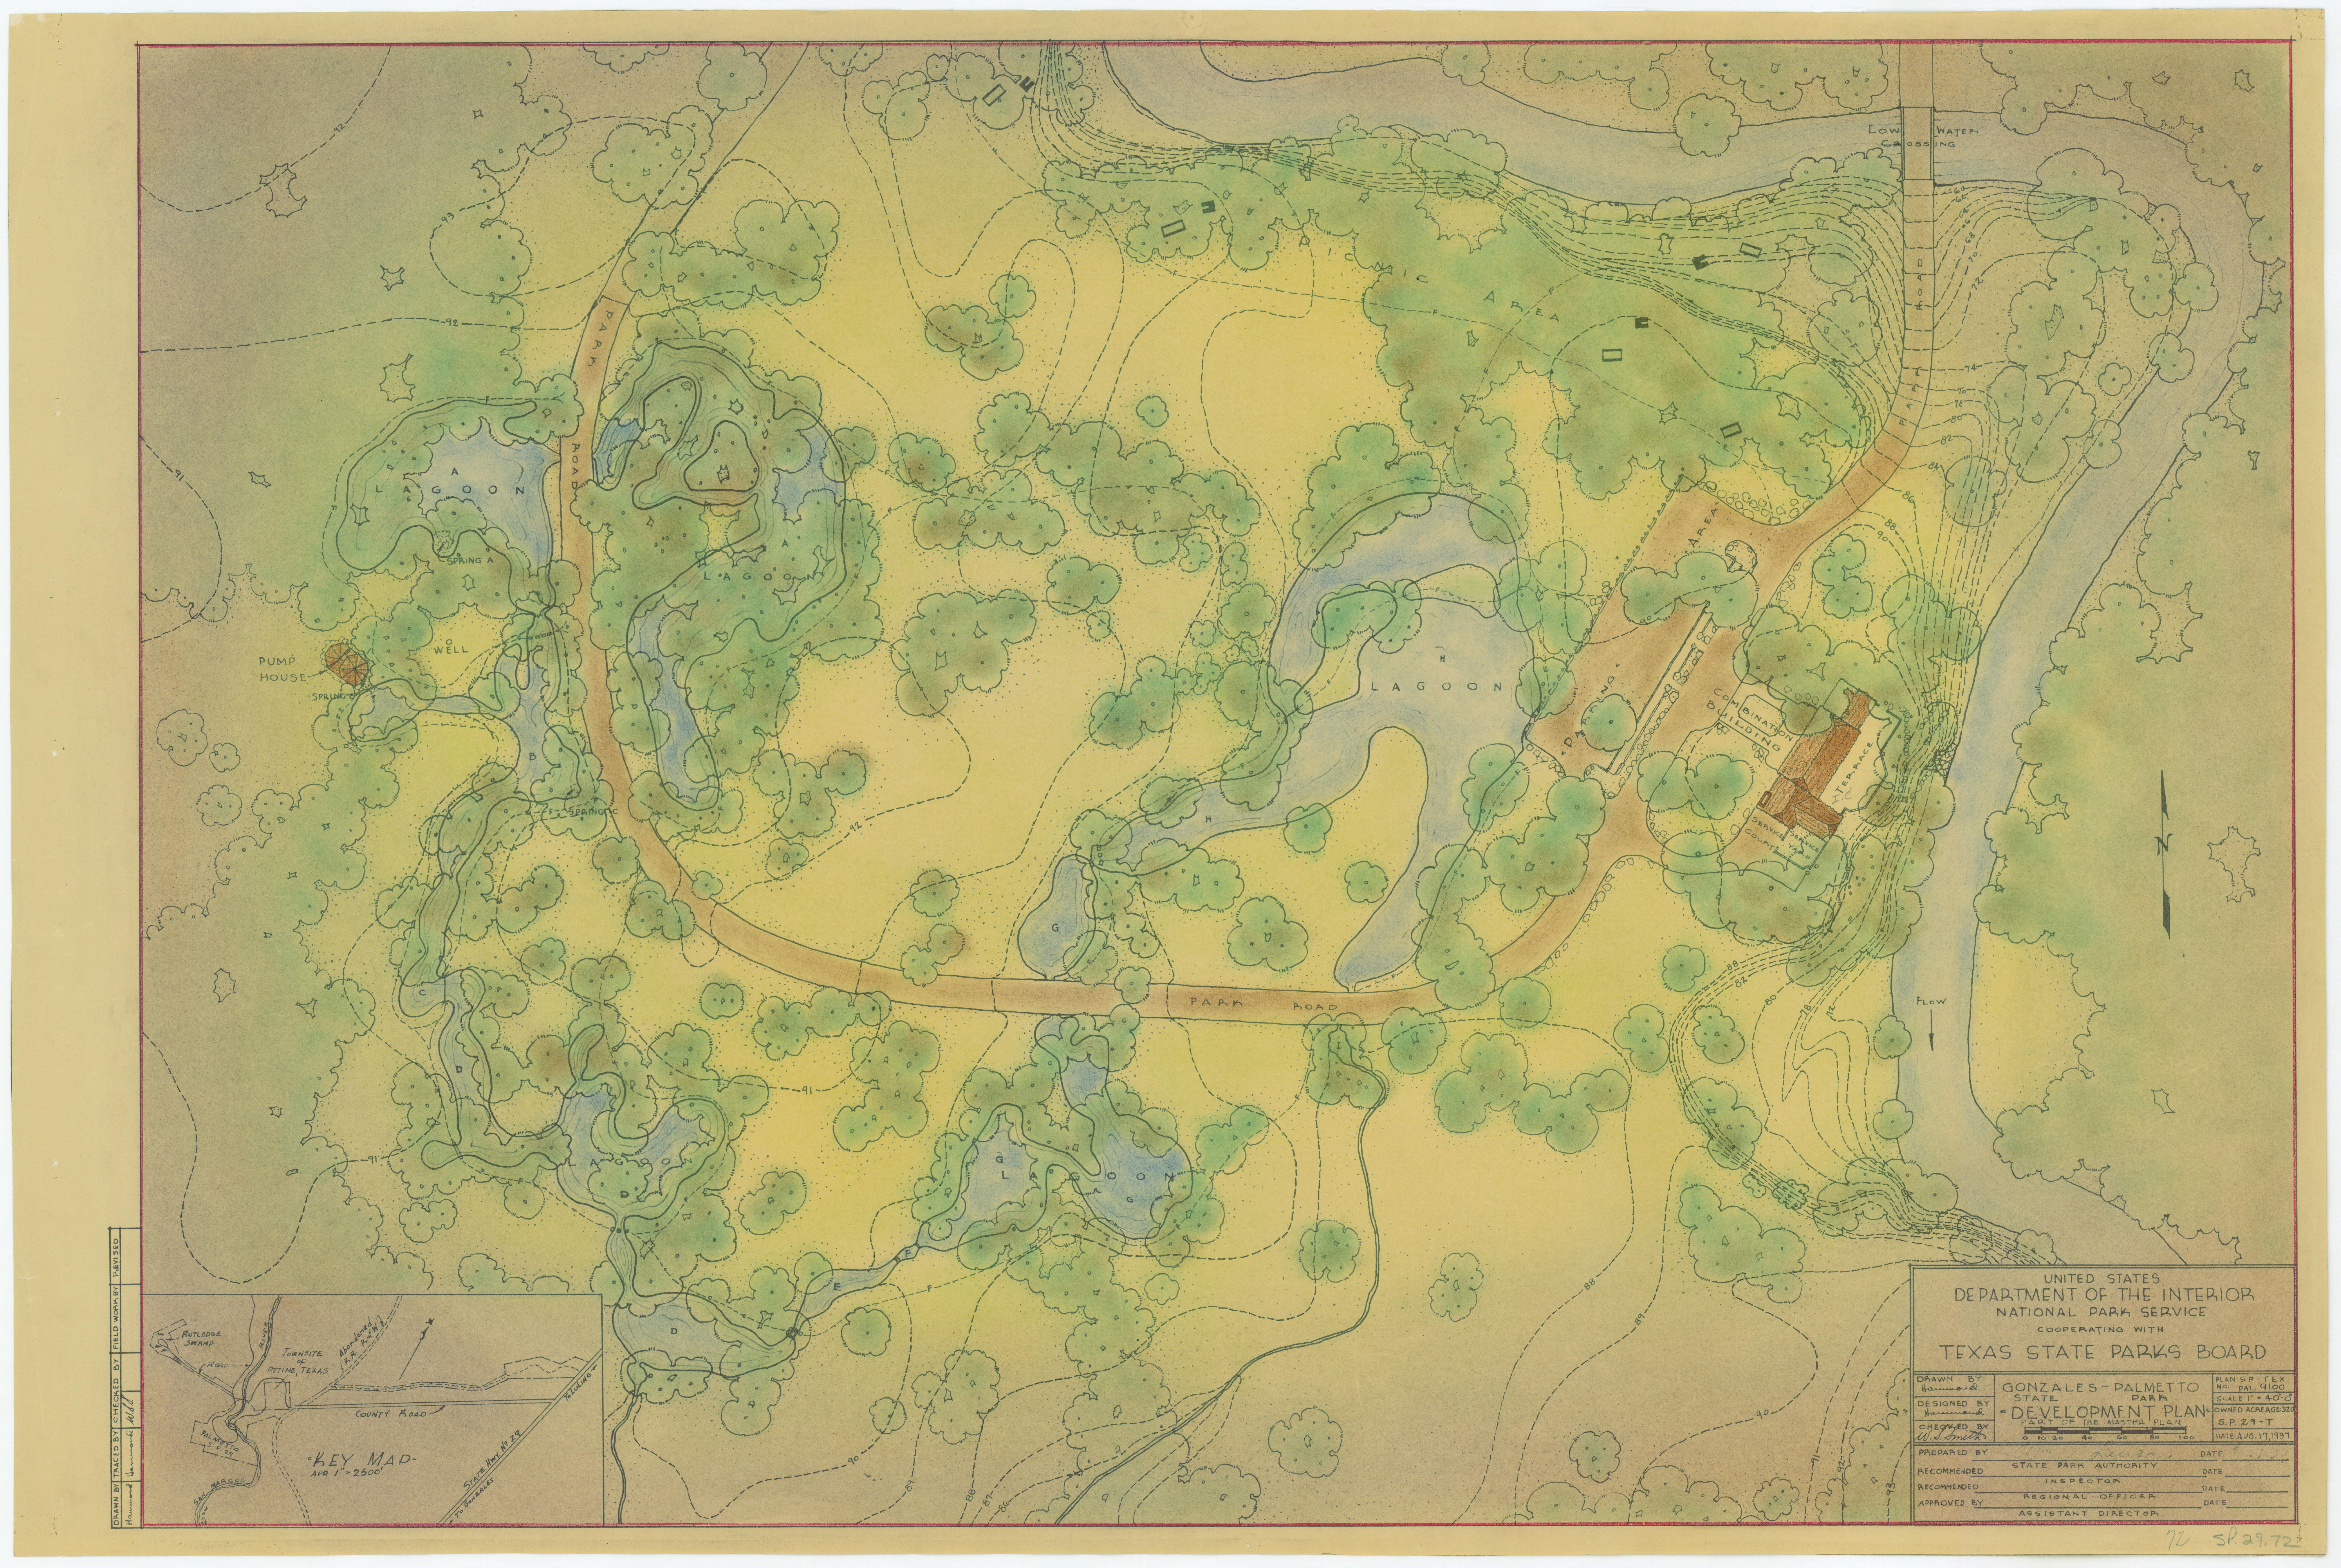 Palmetto State Park - Development Plan - SP29_072